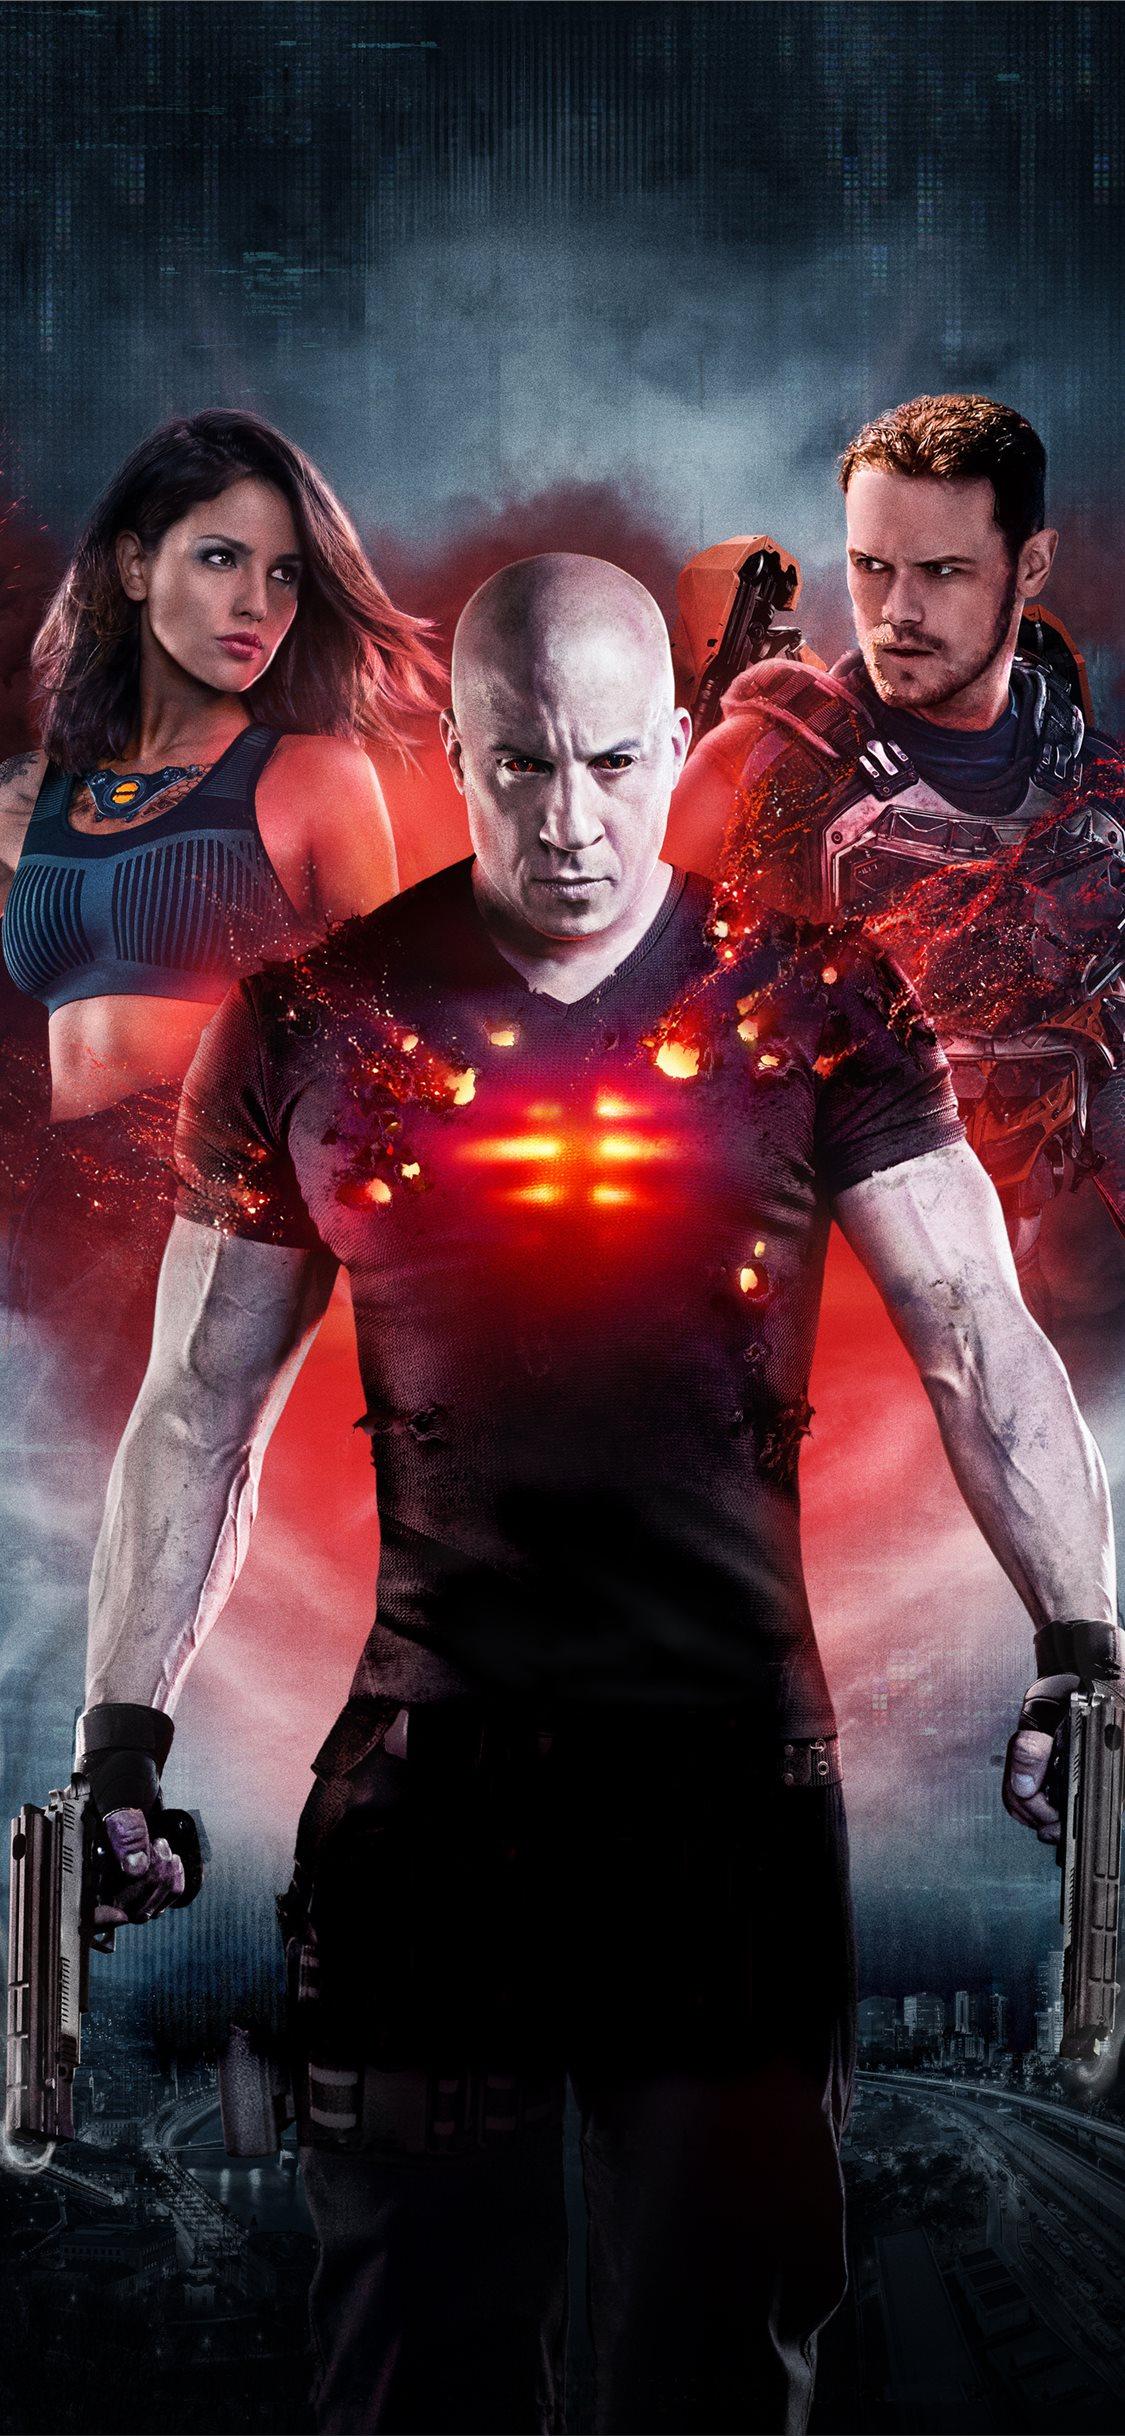 bloodshot movie 5k 2020 iPhone Wallpapers Download 1125x2436